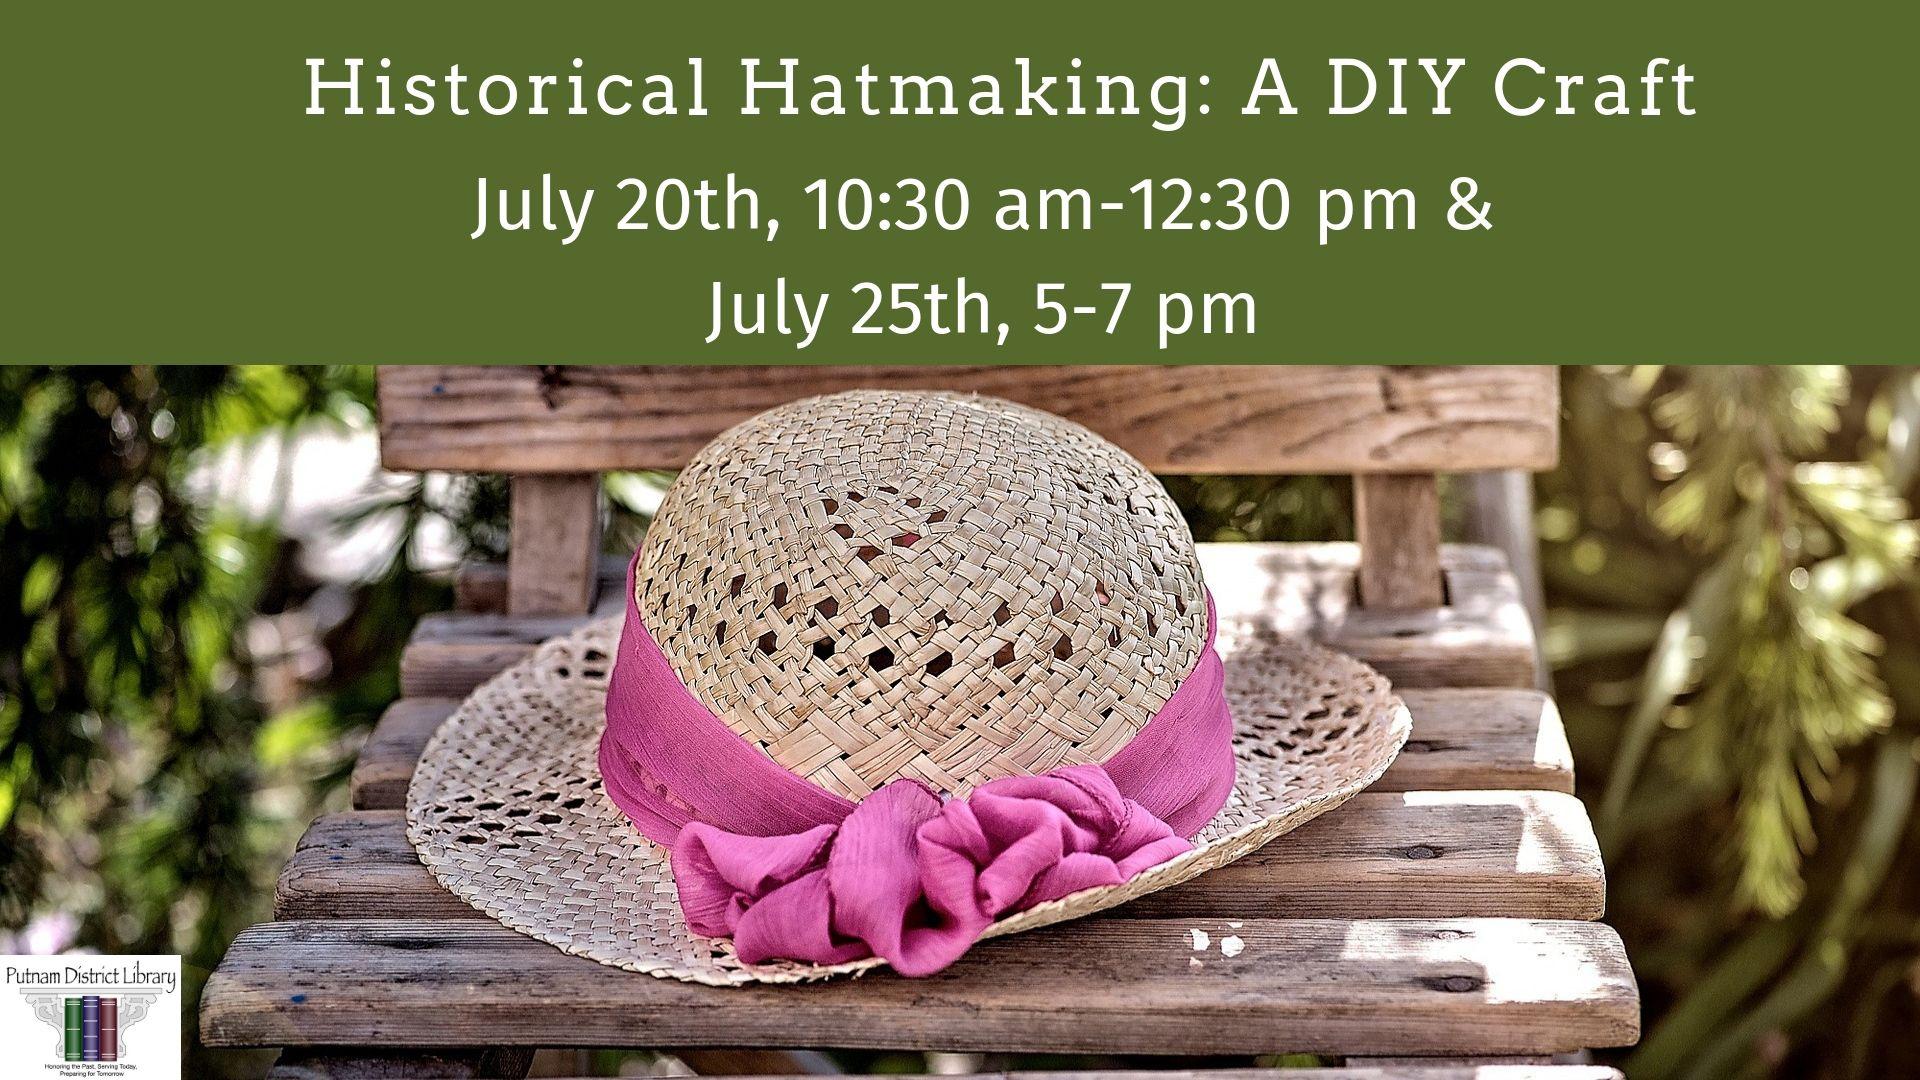 Historical Hatmaking: A DIY Craft